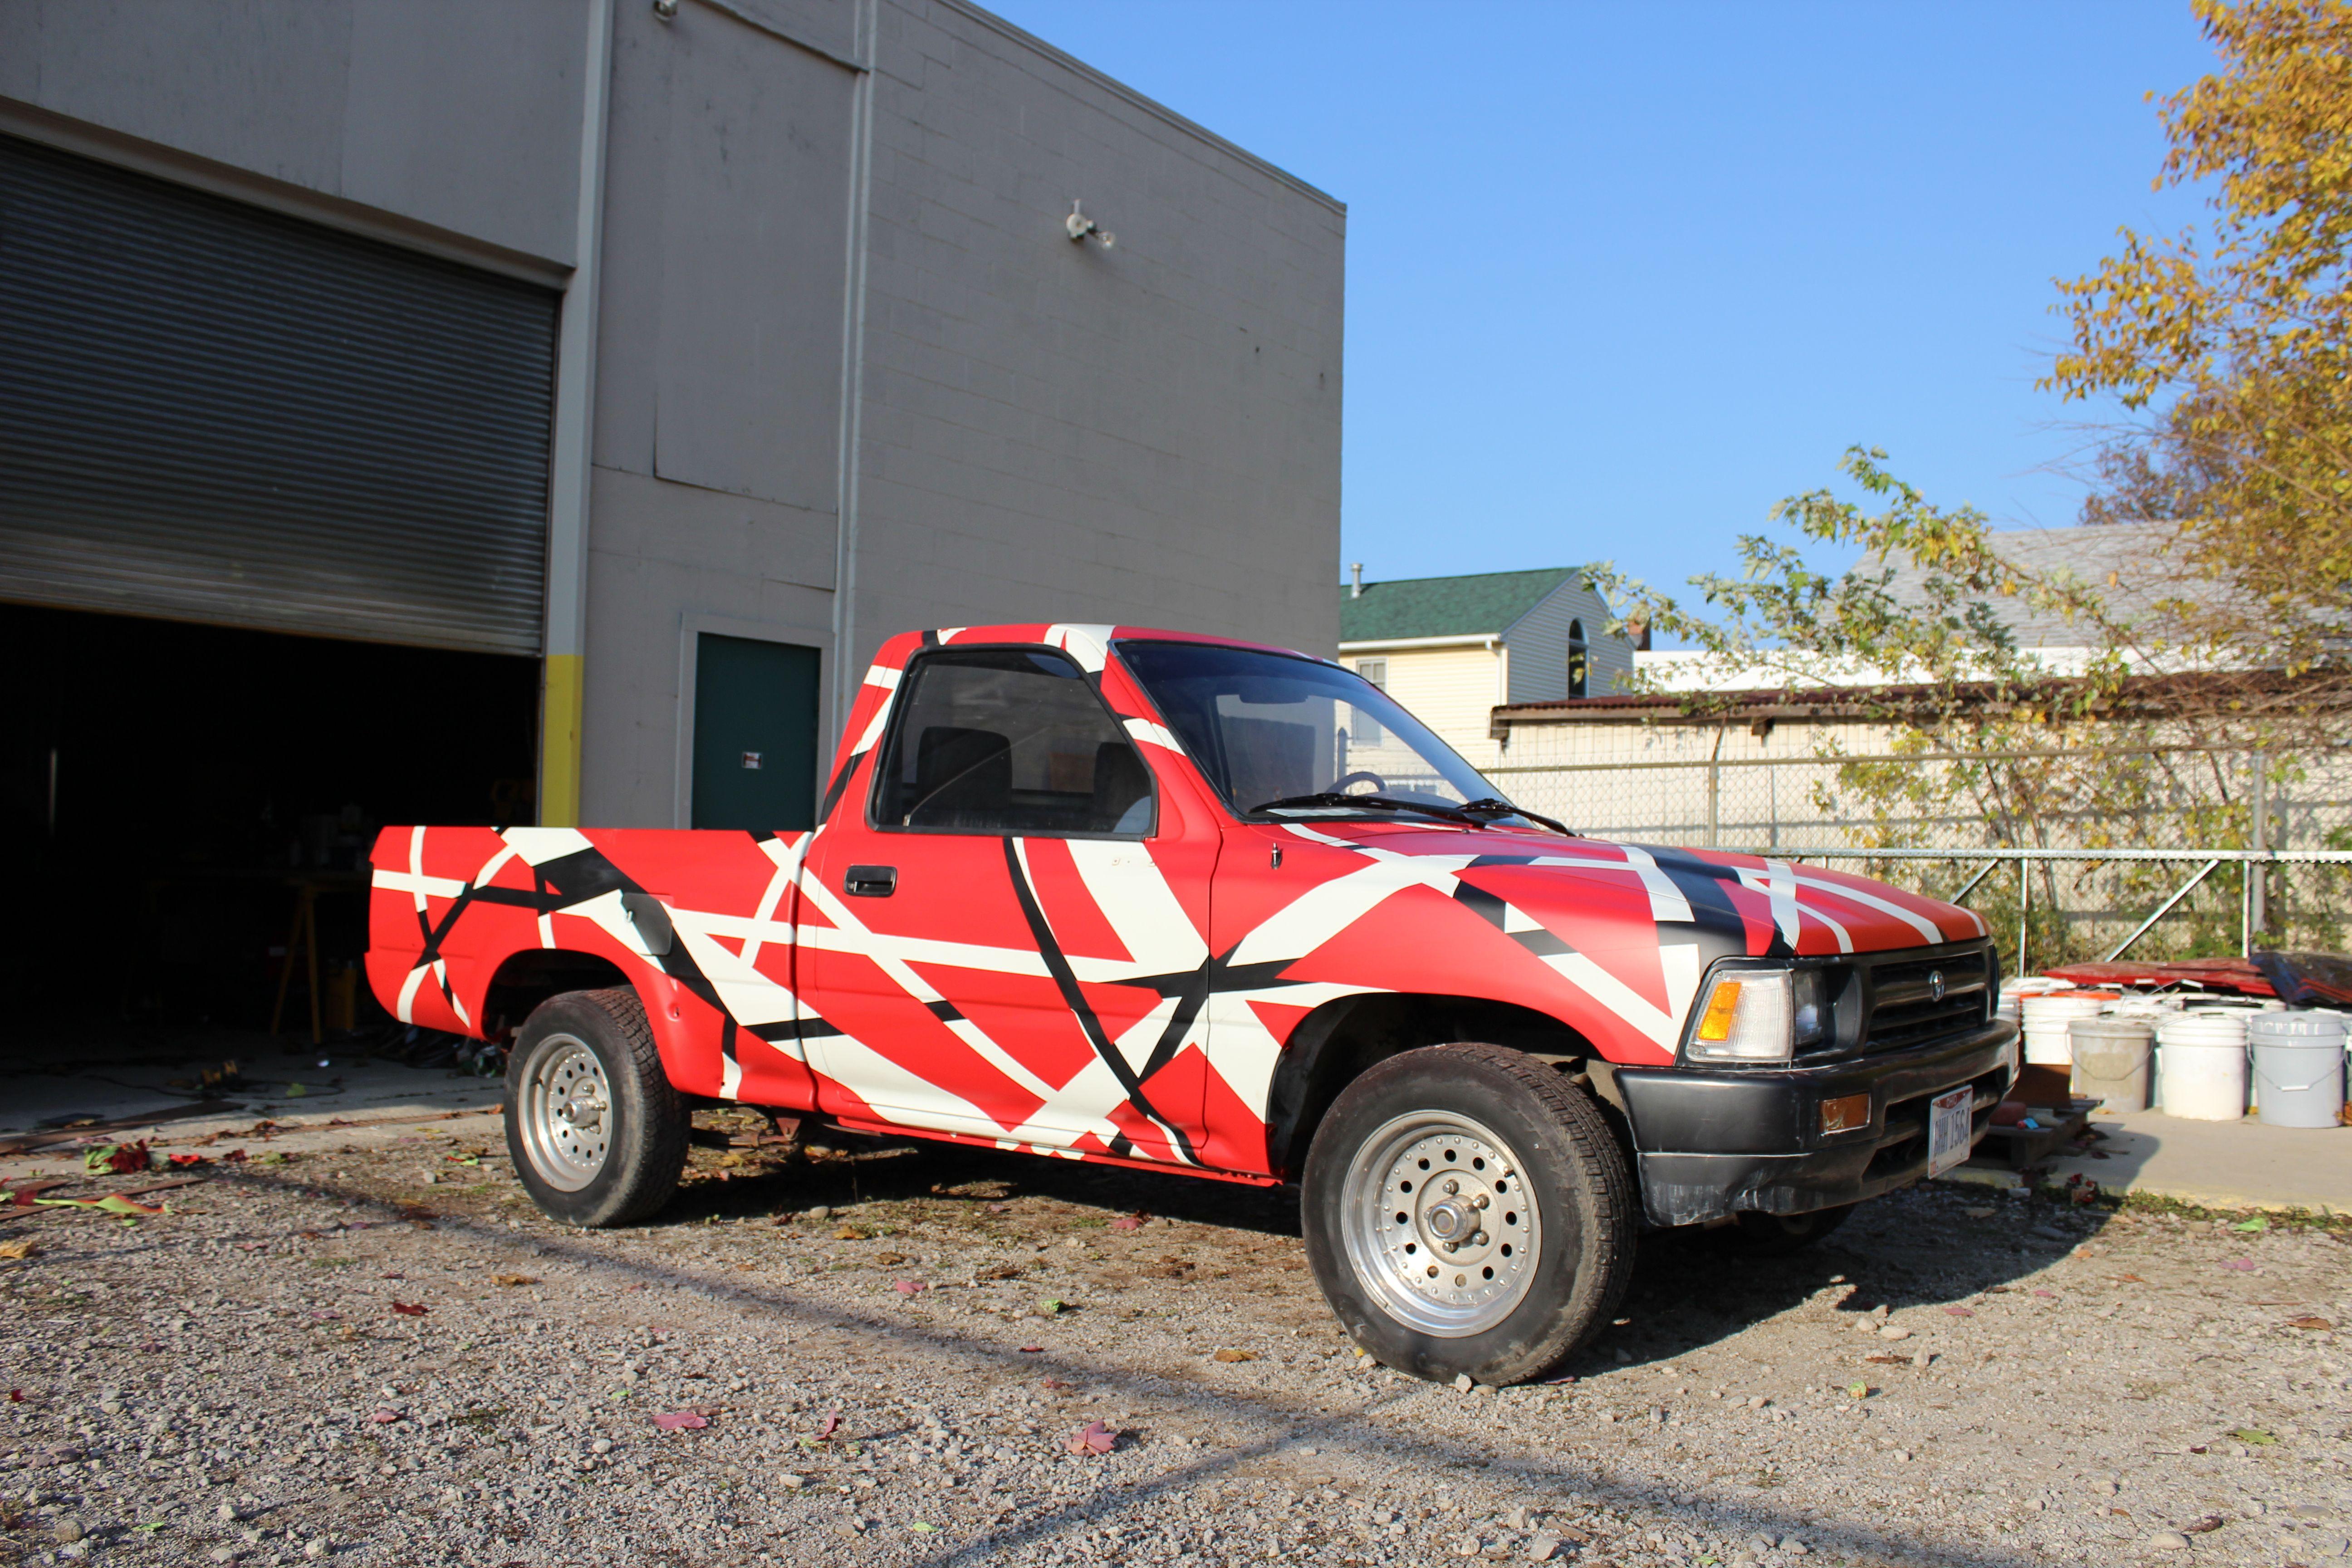 Van Halen Pick Up Truck Project X Humphrey Industries Spray Paint Artwork Spray Paint Projects Car Spray Paint